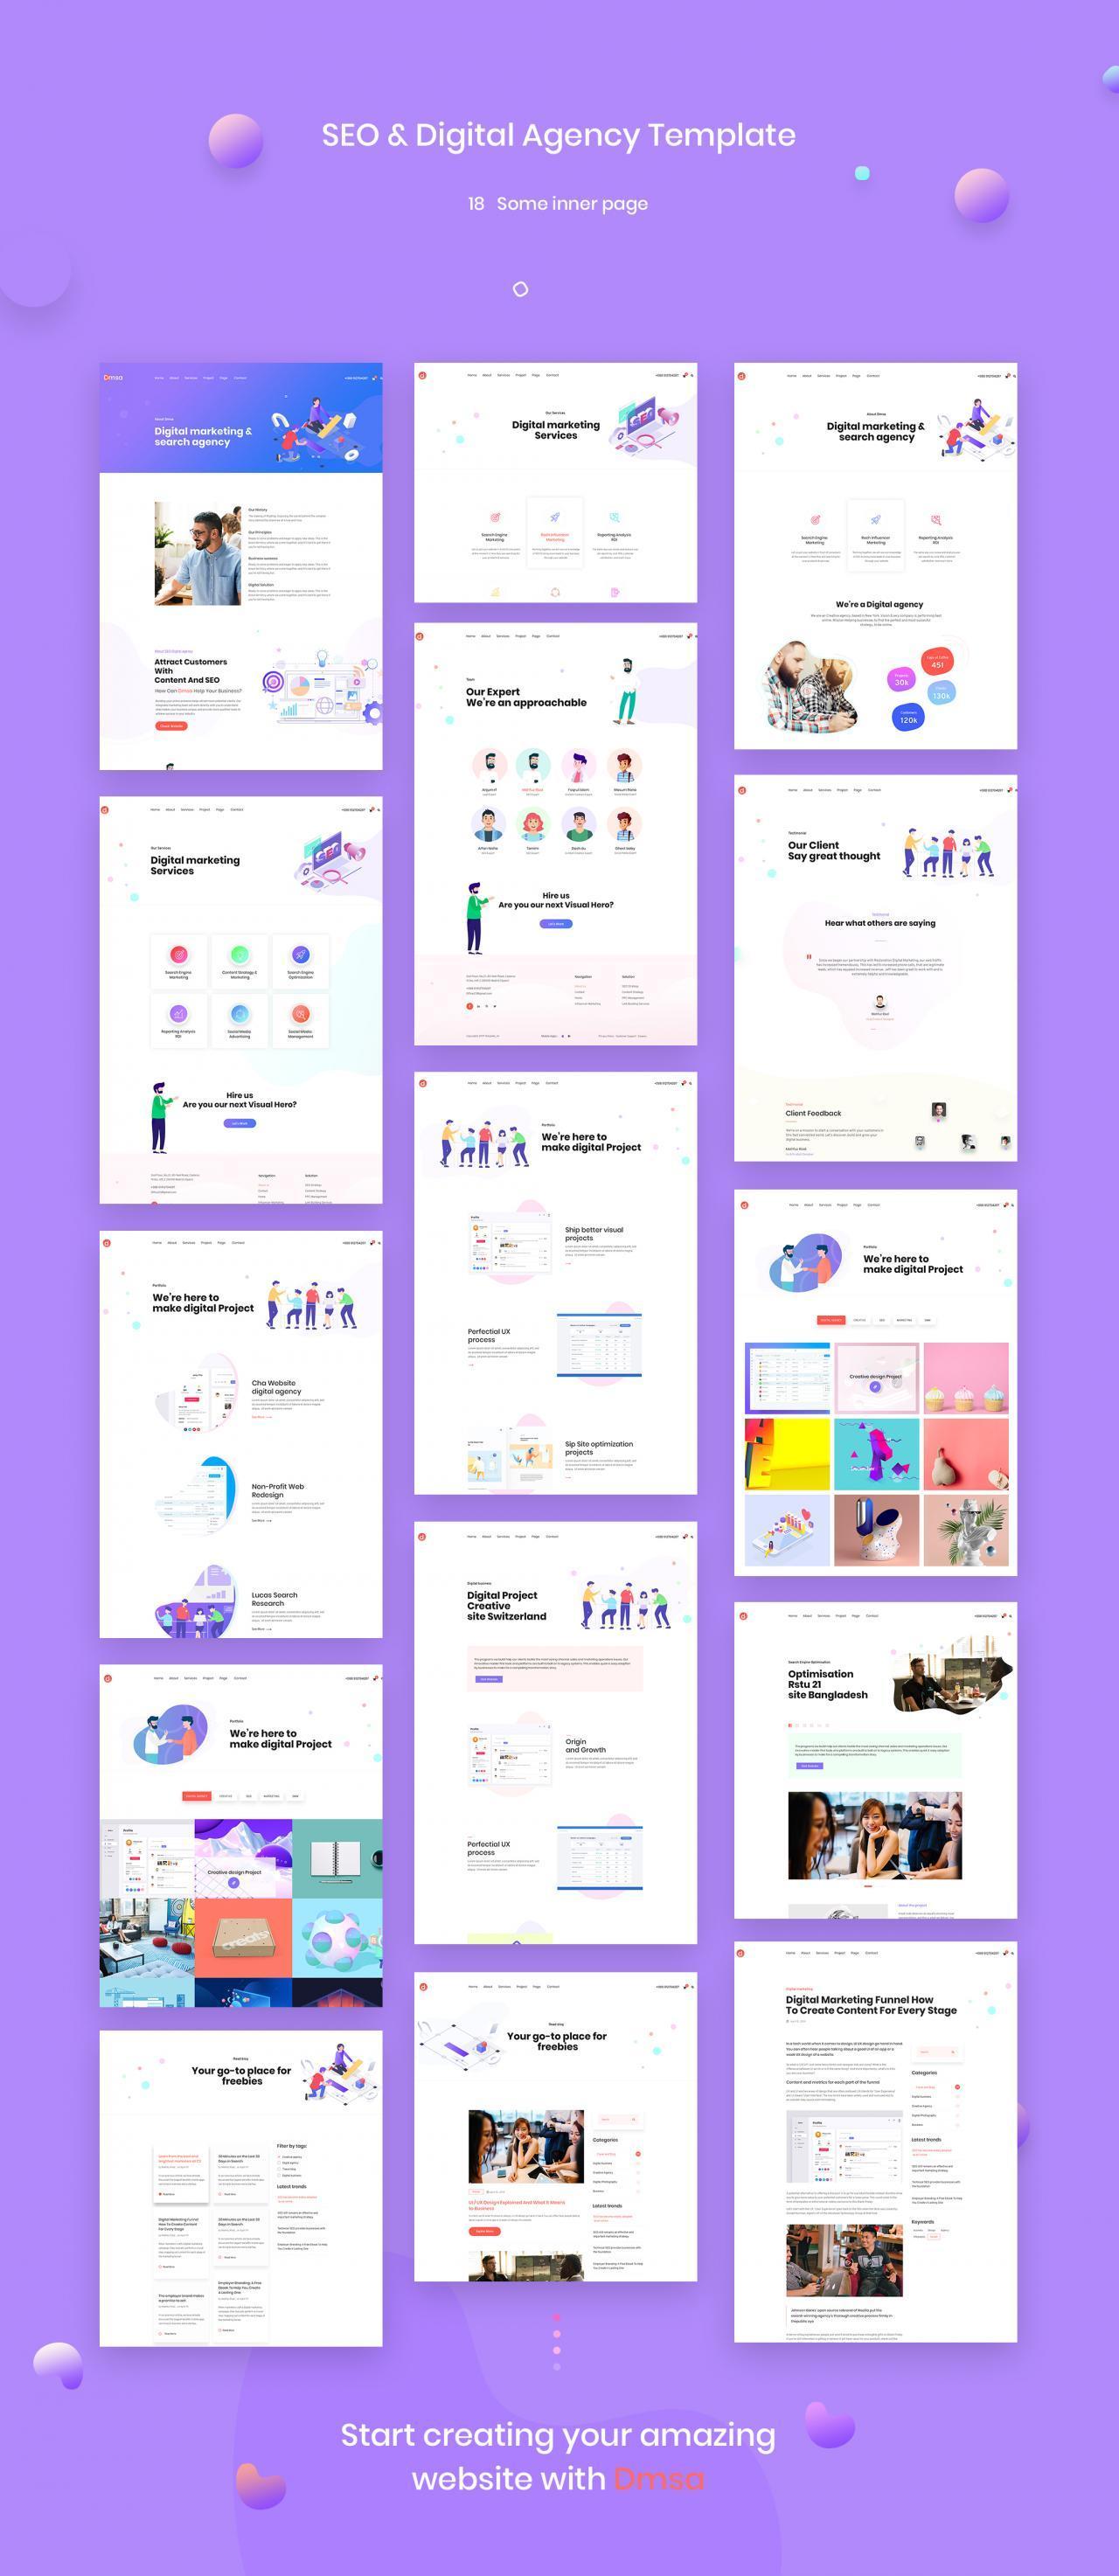 SEO优化WEB企业网站UI界面设计模板套件 Dmsa – SEO & Digital Agency Template插图(7)